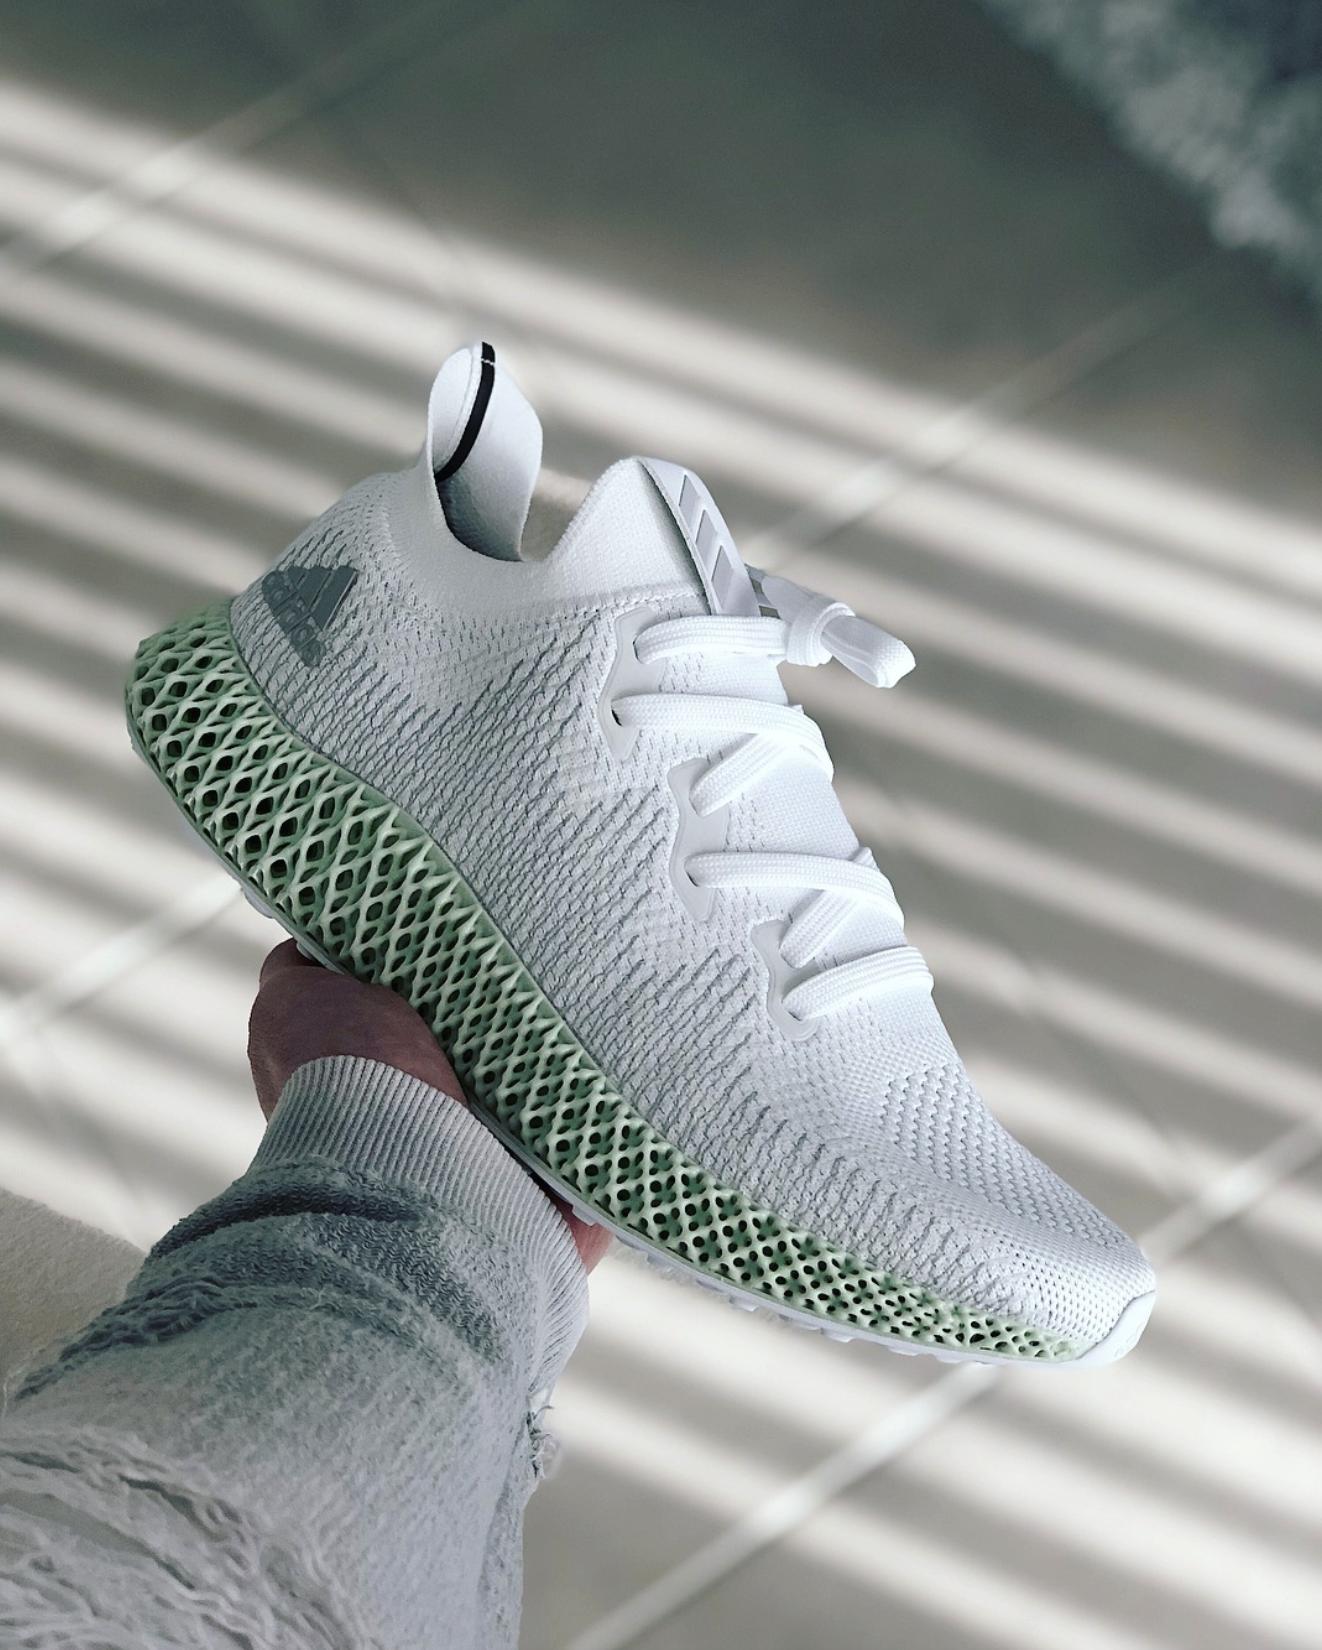 93a0a6210a72b Still looking for Adidas Futurecraft 4D Sneakers  ▻ Shop at KLEKT now.  (Click on Link)  klekttakeover 📸  frieze43